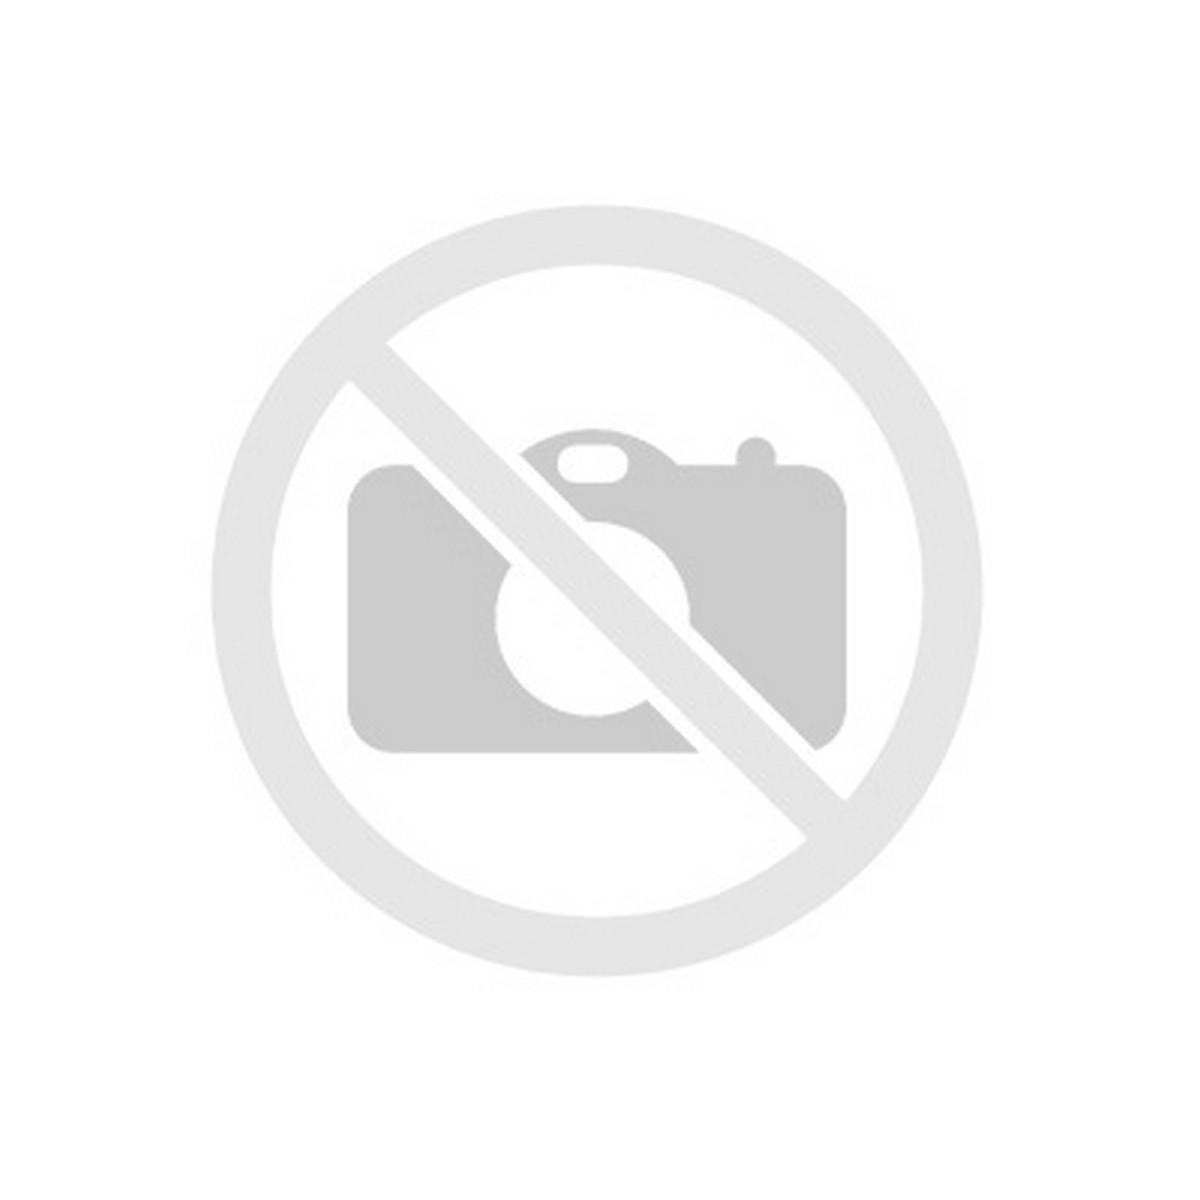 Дип Starbaits Dip Attractor SK30